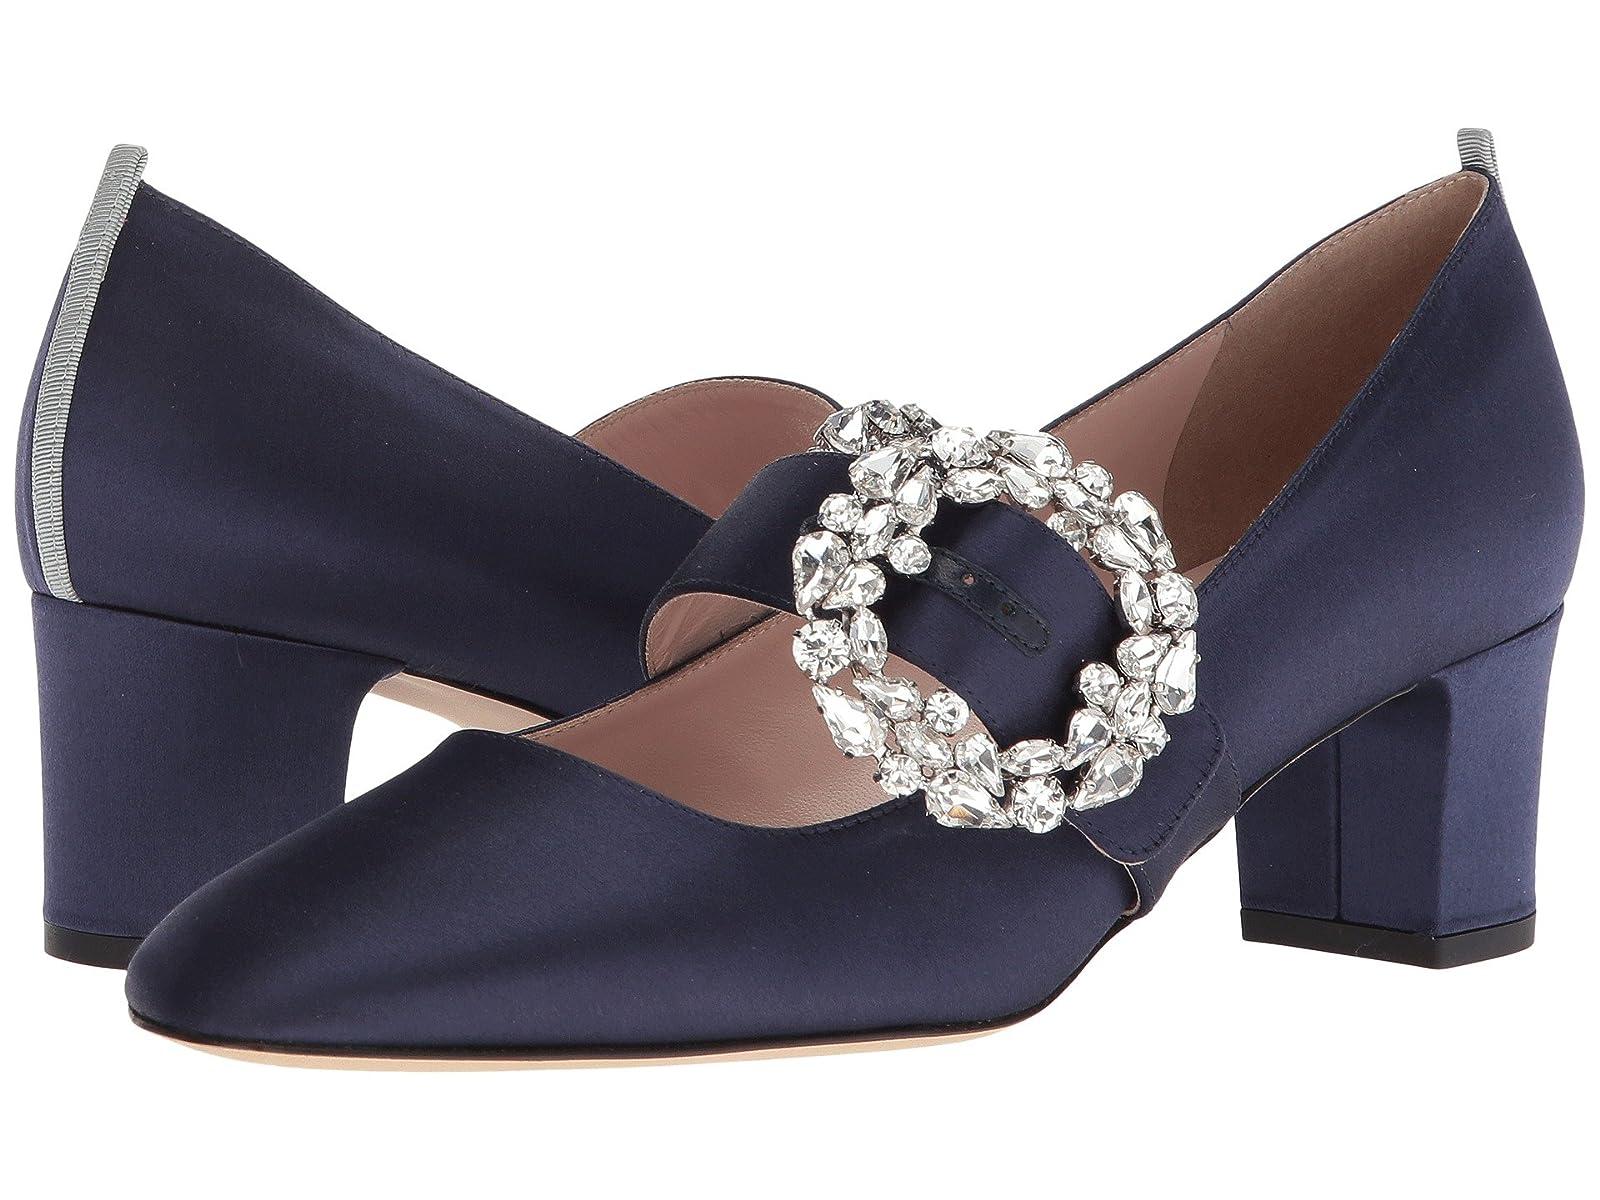 SJP by Sarah Jessica Parker CosetteAtmospheric grades have affordable shoes